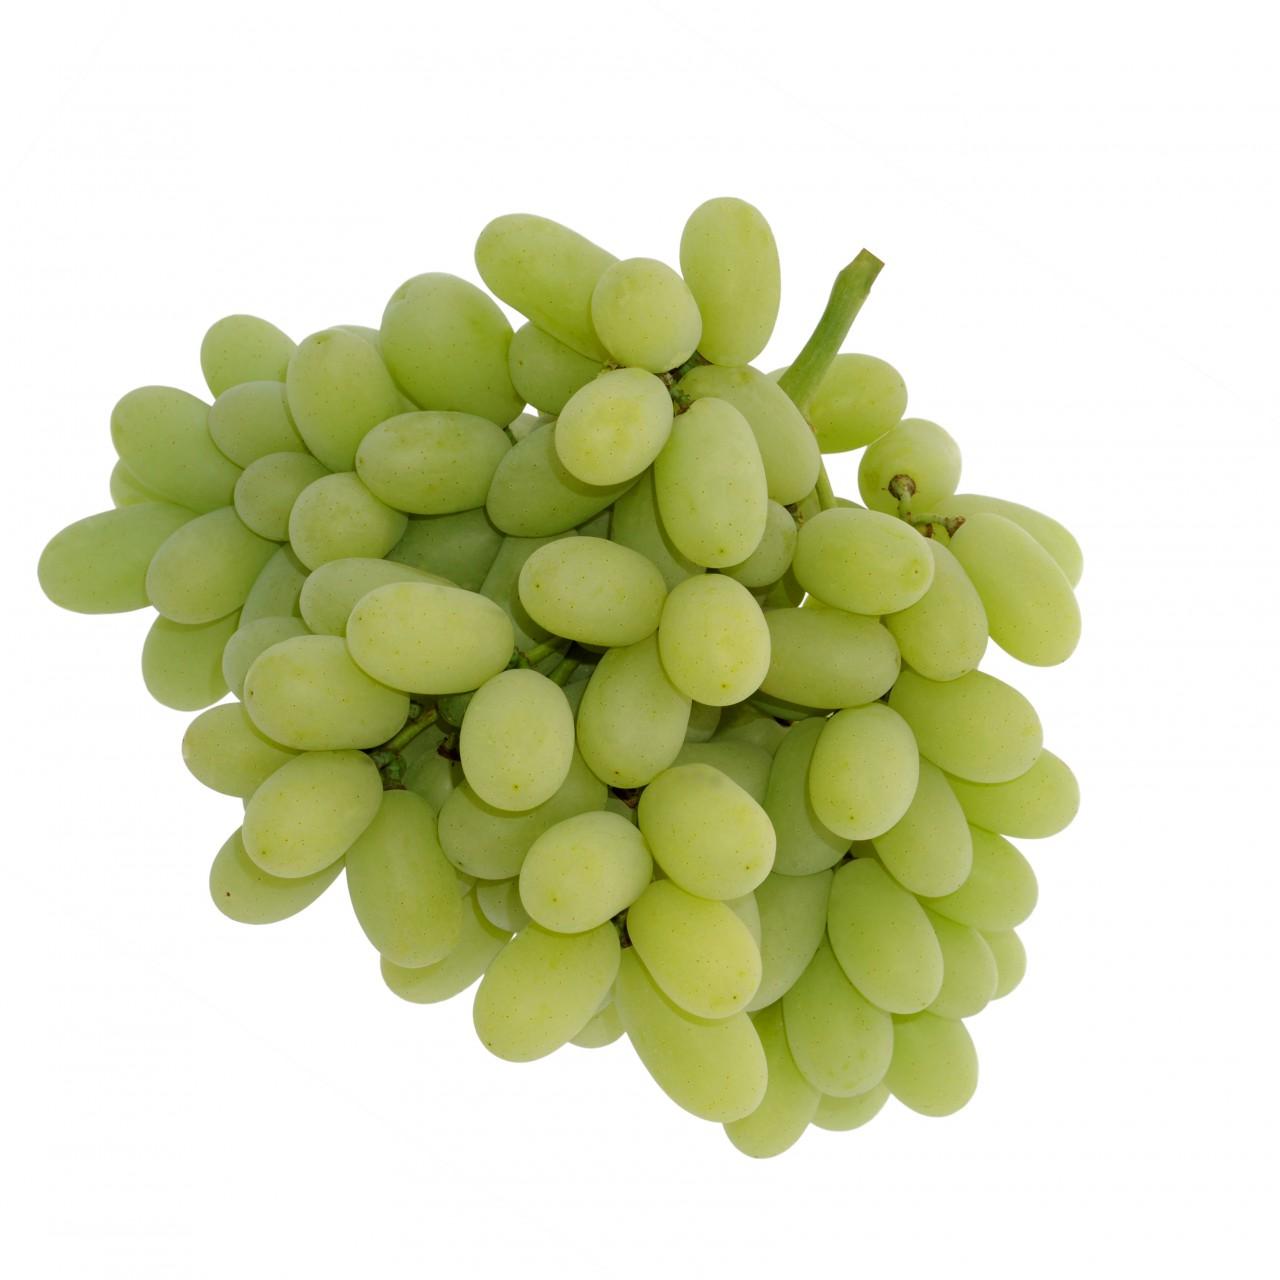 Pristine Seedless